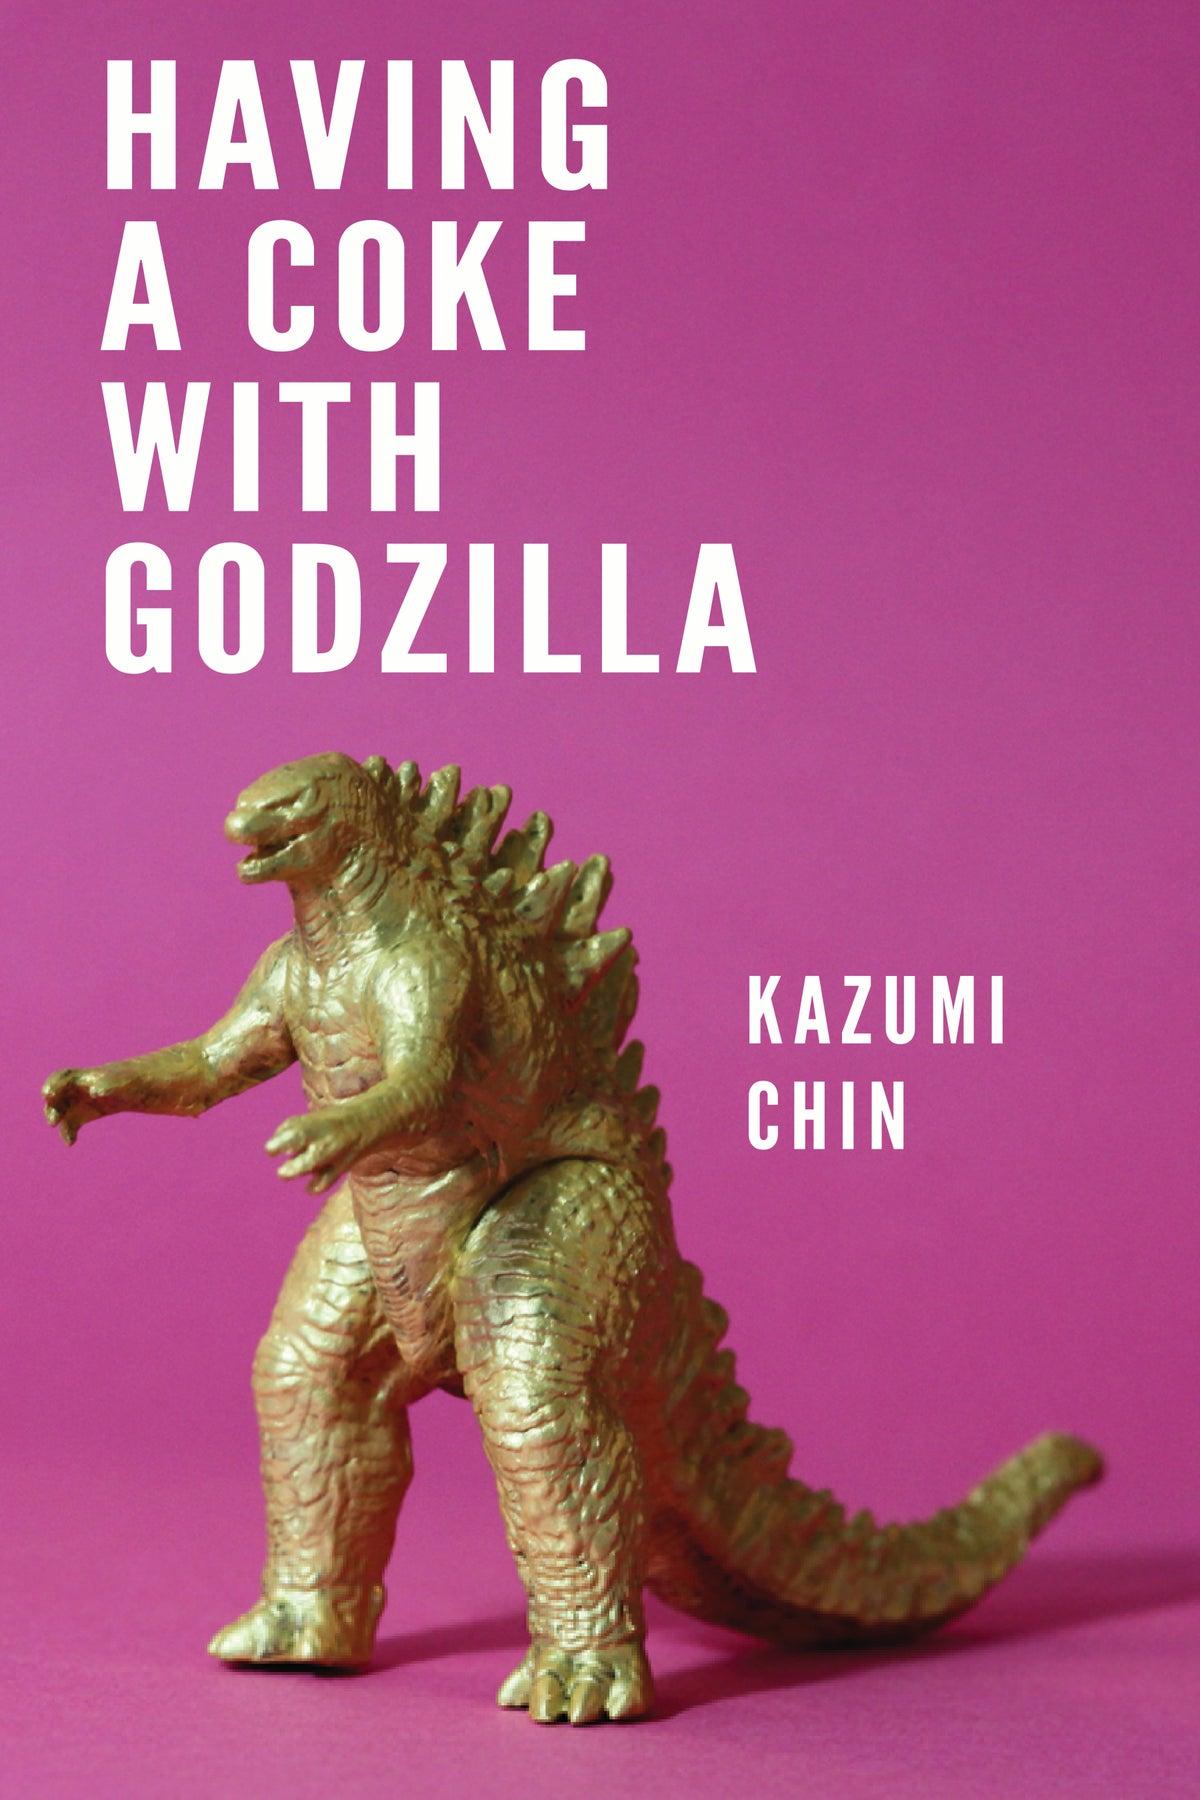 Image of Having a Coke with Godzilla by Kazumi Chin *PRE-ORDER*